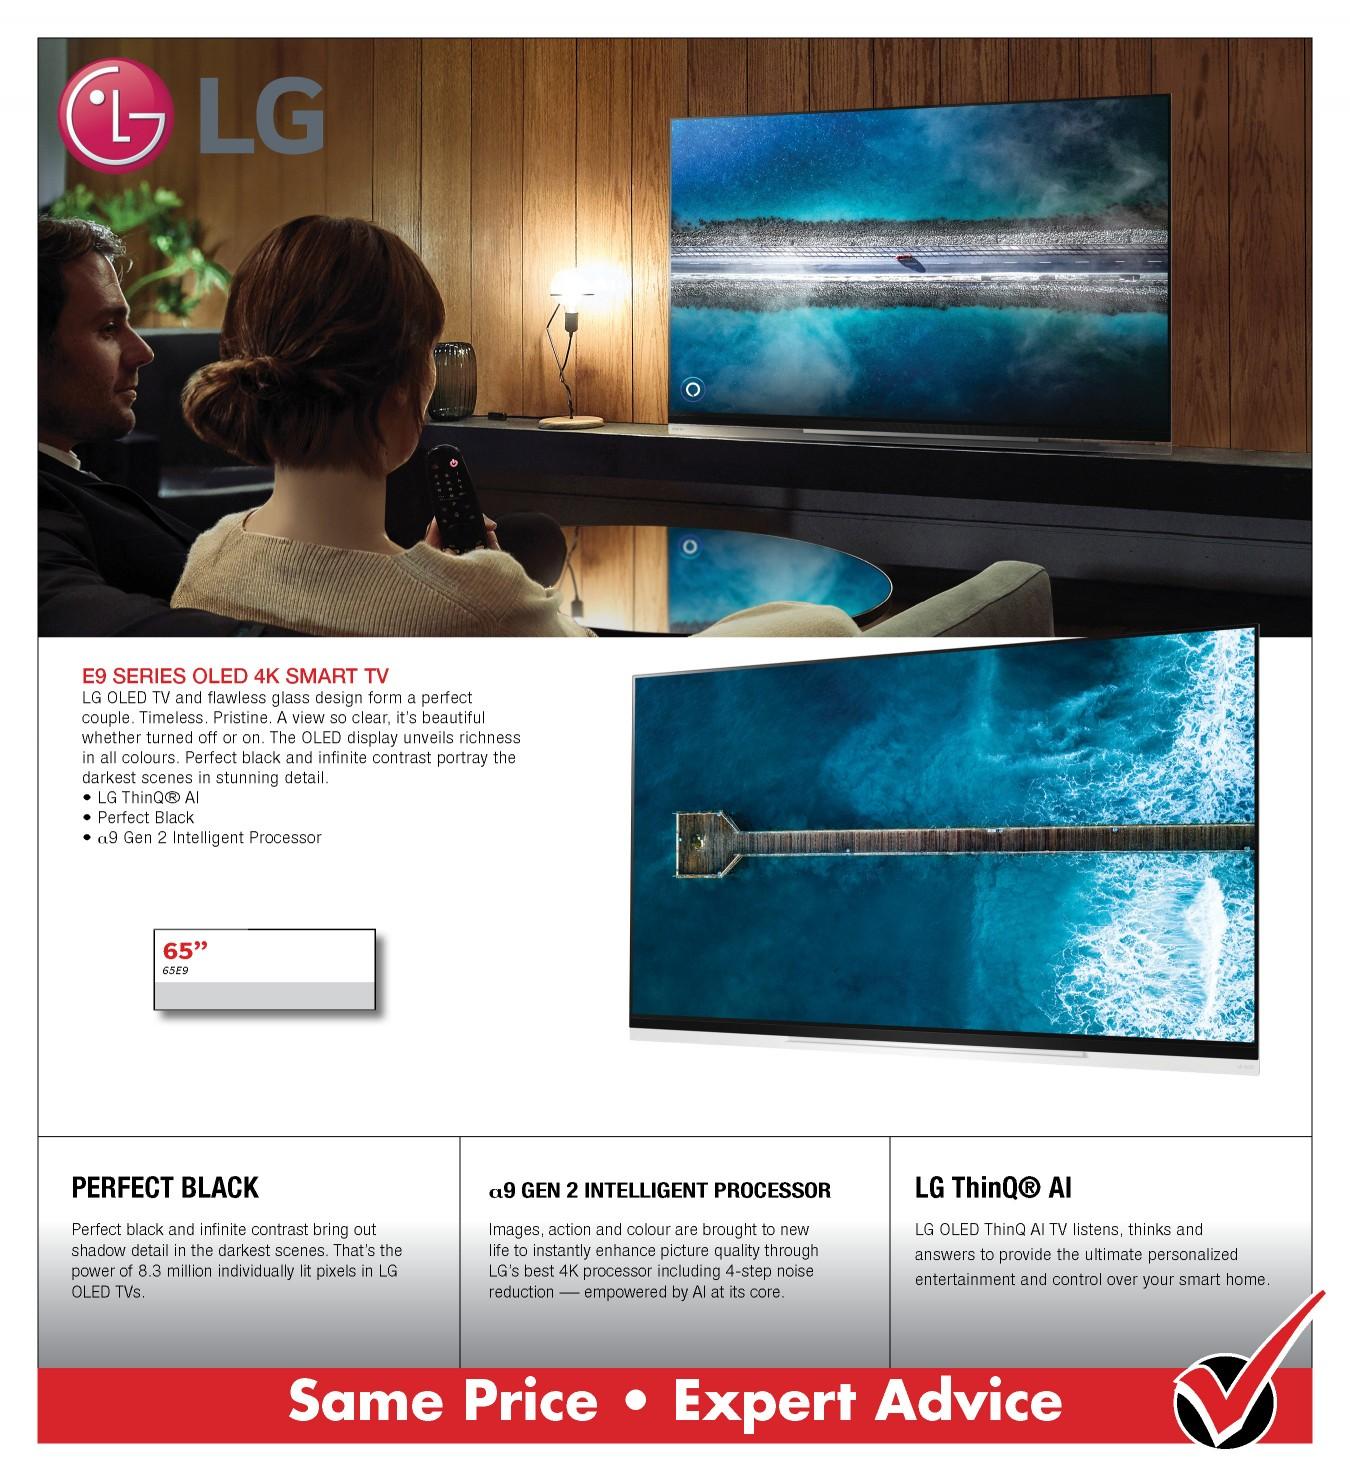 LG E9 OLED 4K SMART TV